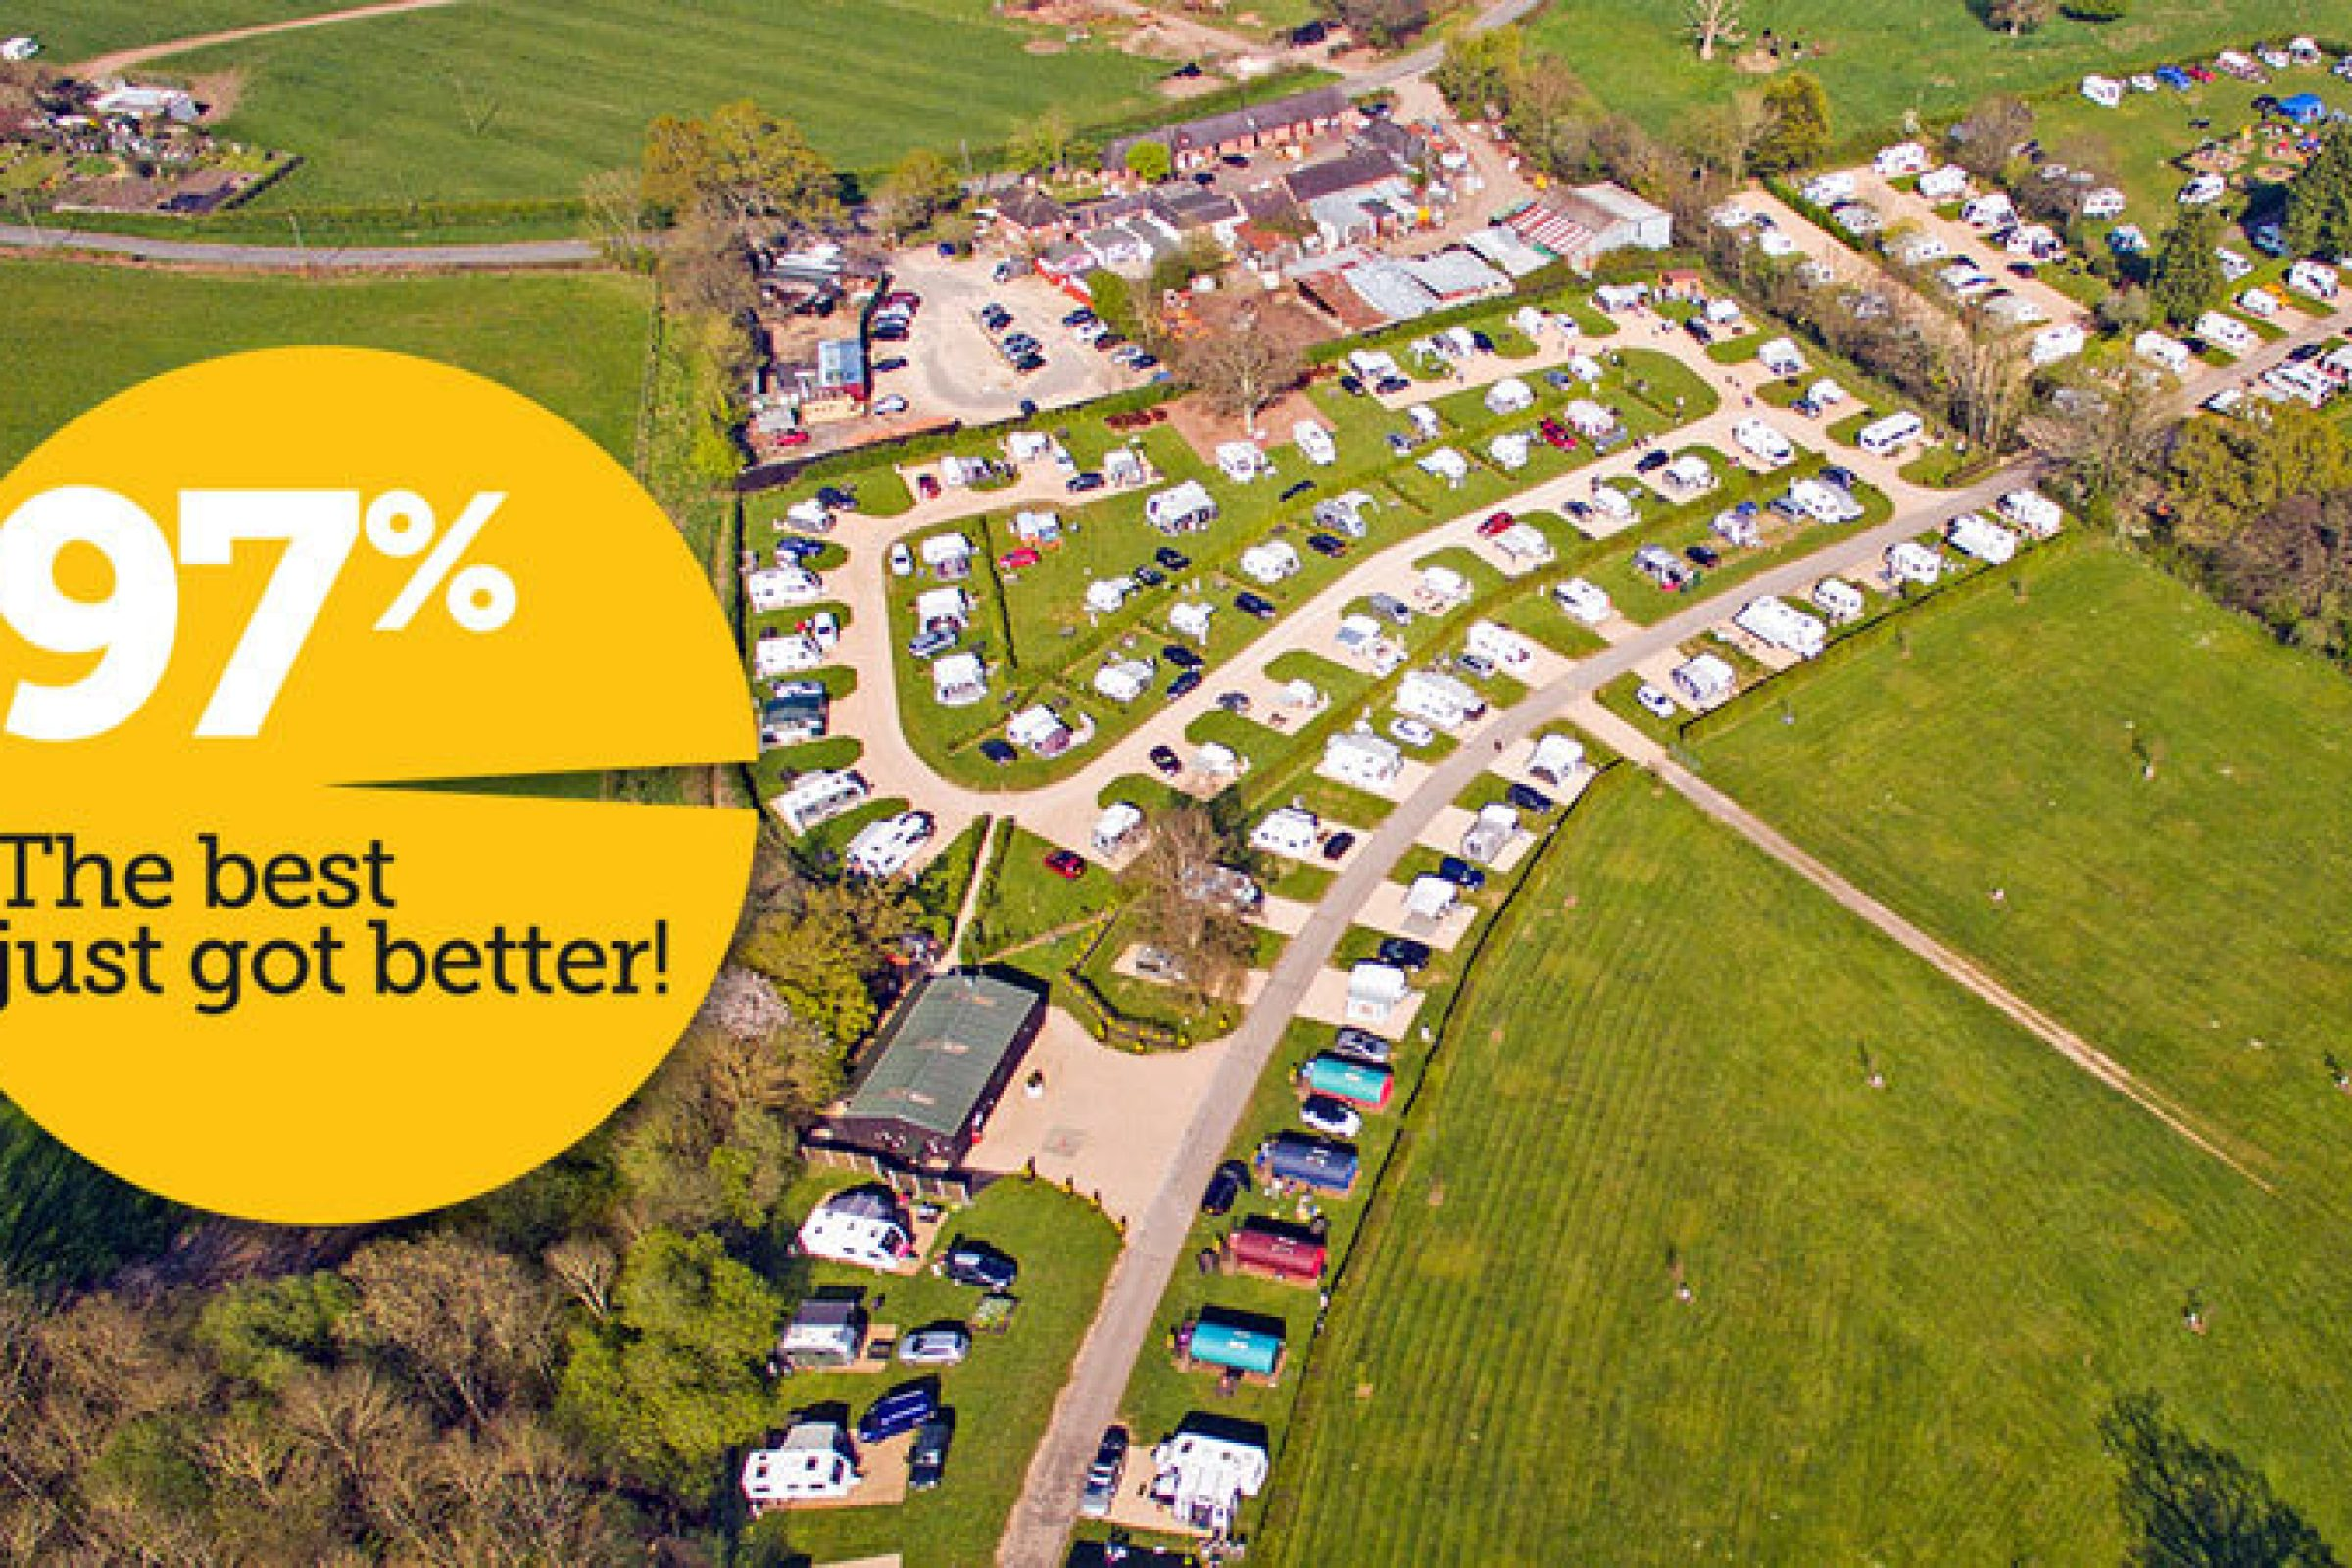 The best just got better! South Lytchett Manor's AA quality score now 97% 01